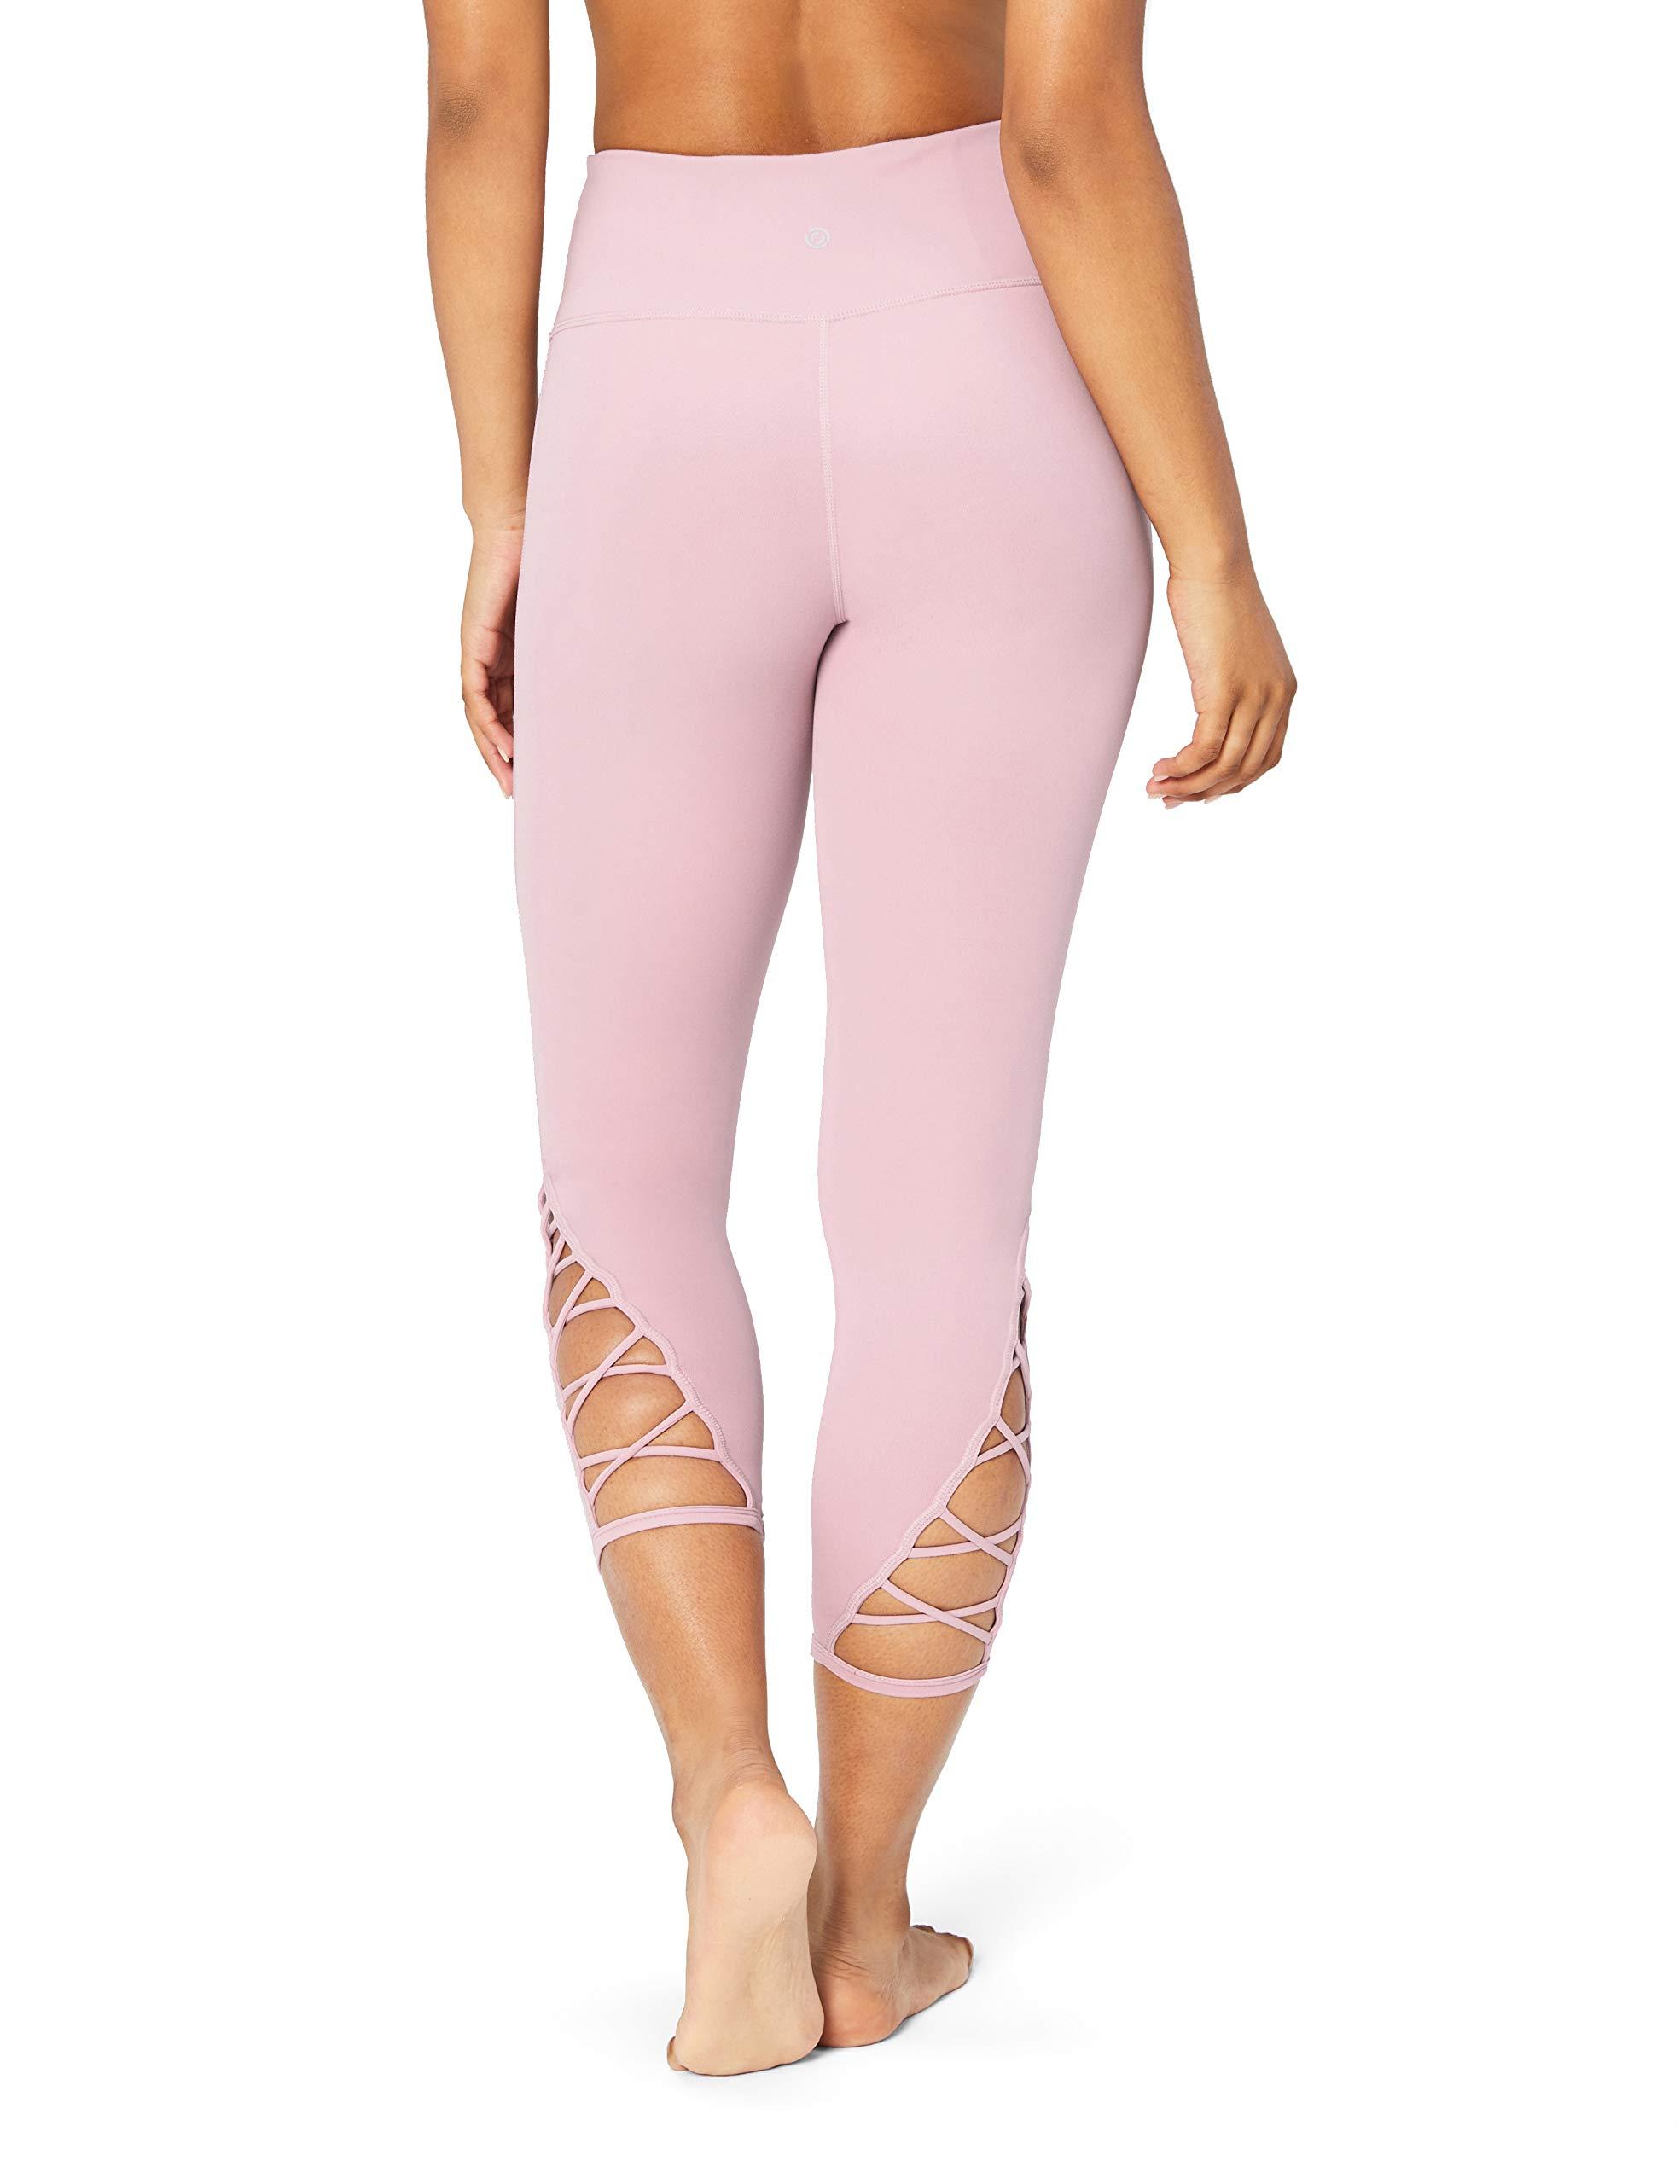 "hohe Taille 48,3/cm, XS-3X Marke: Core 10 Damen Capri-Leggings /""Spectrum/"" f/ür Yoga"